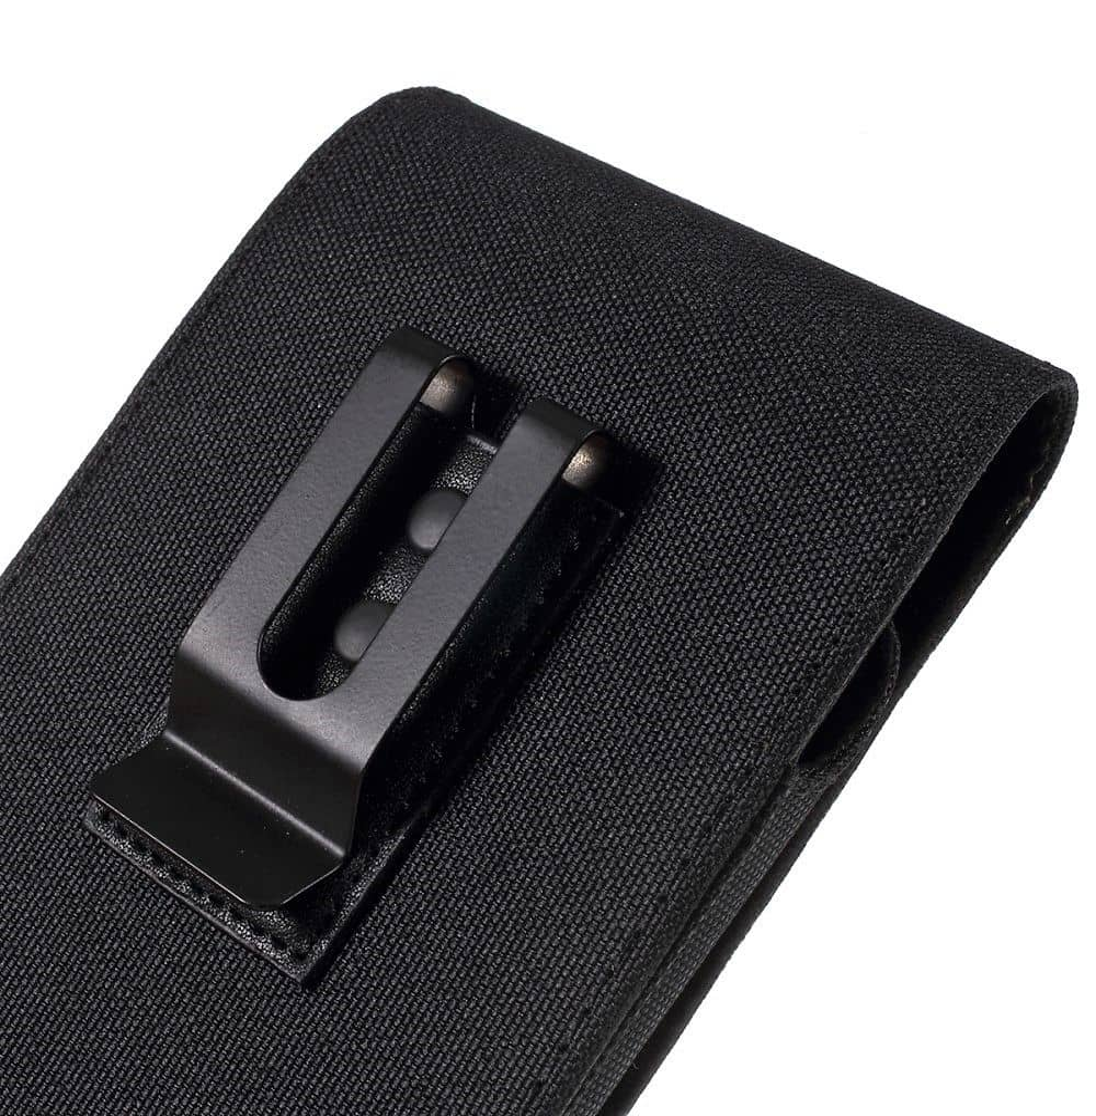 thumbnail 30 - Accessories For BlackBerry KEY2 Last Edition (2020): Case Sleeve Belt Clip Ho...